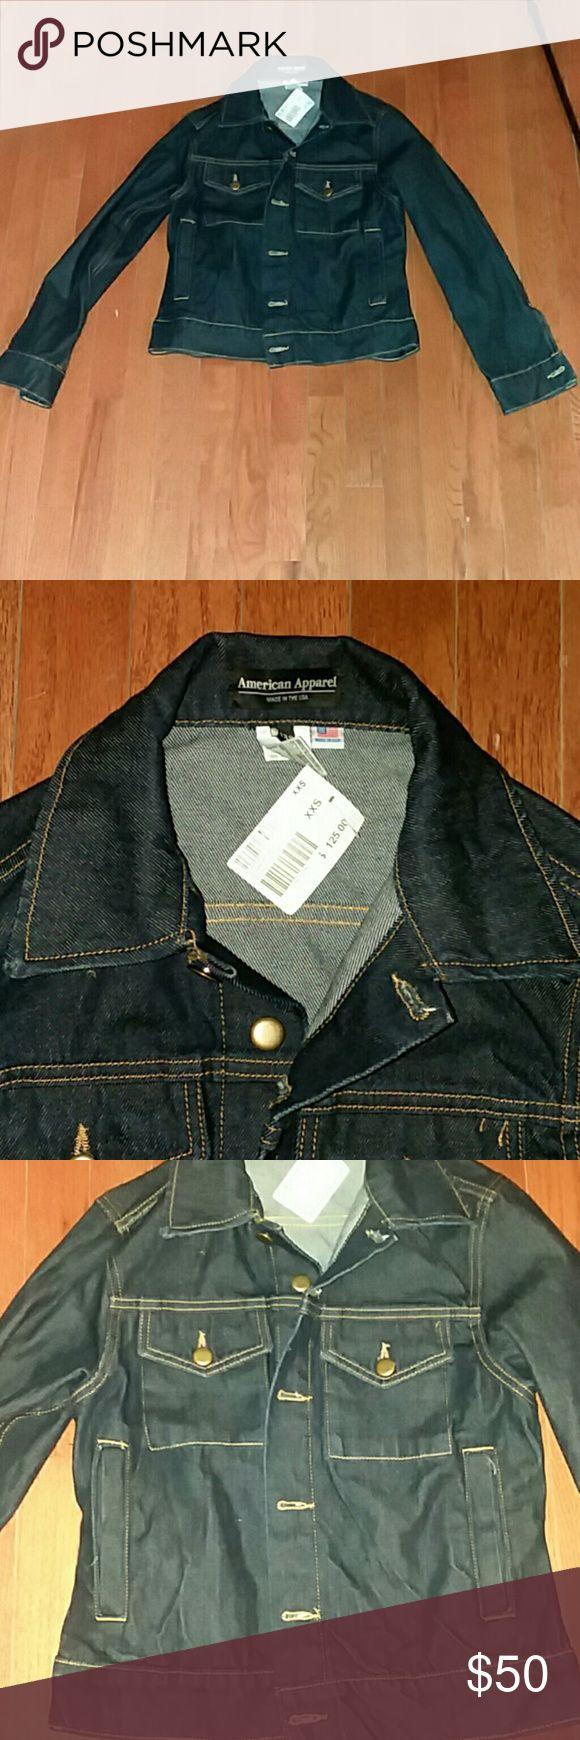 American Apparel  dark wash indigo denim jacket American Apparel resin dark wash indigo  denim button up jacket size xxs. Unisex. Runs large American Apparel Jackets & Coats